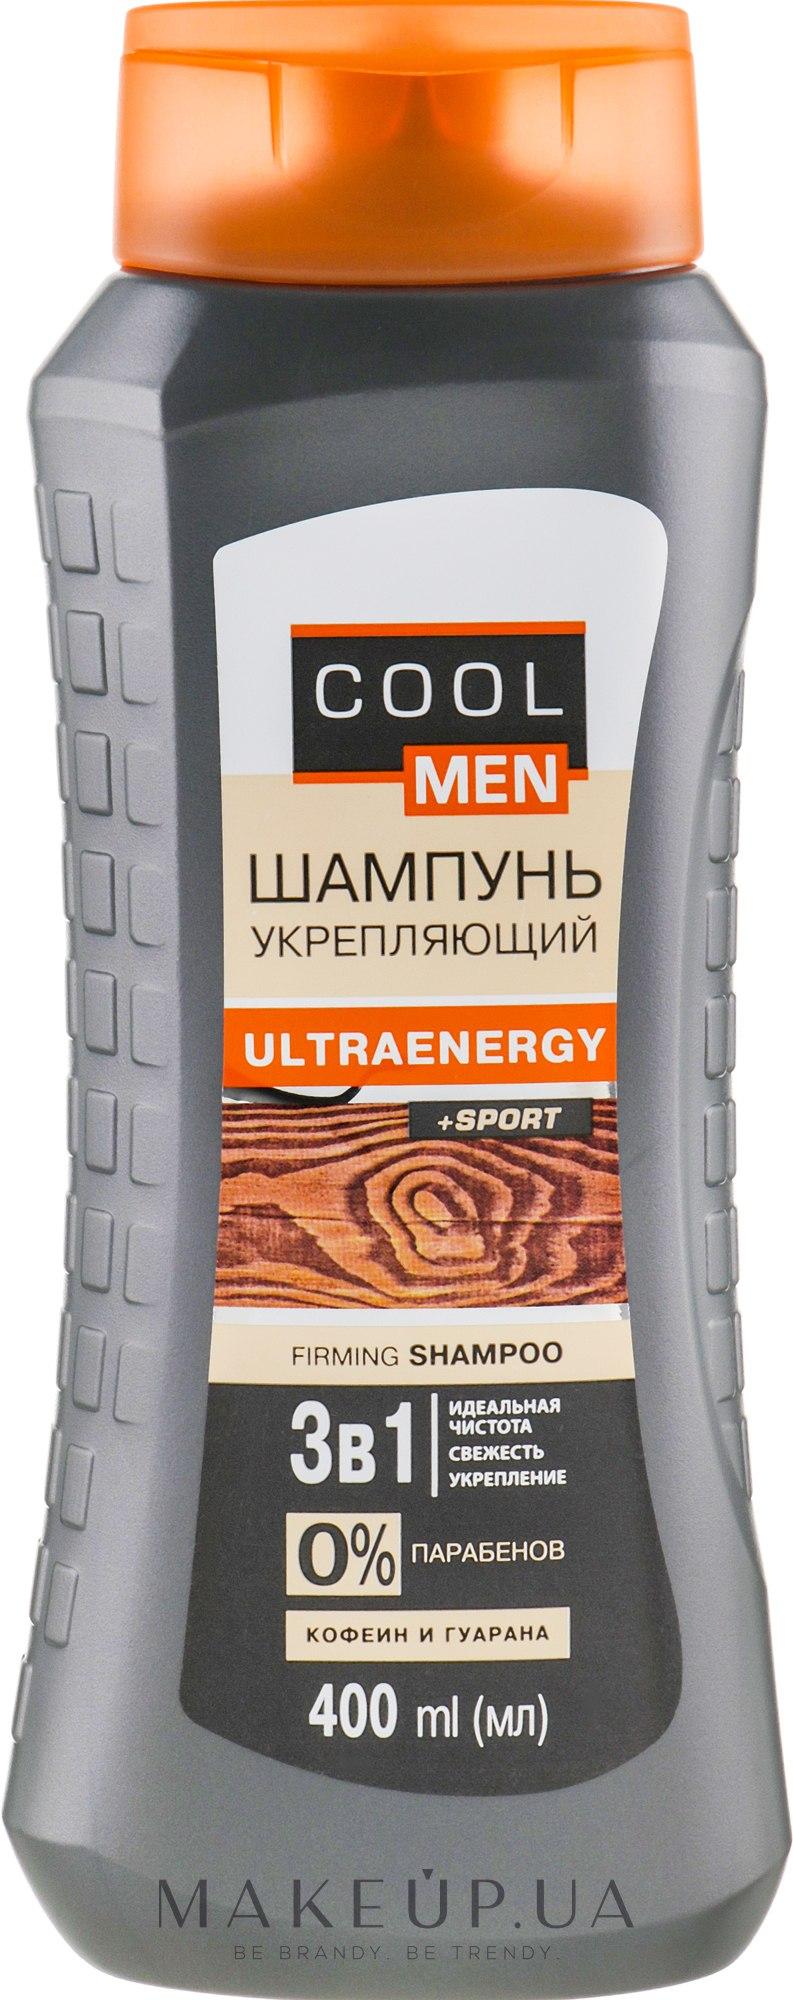 "Шампунь"" - Cool Men — фото 400ml"